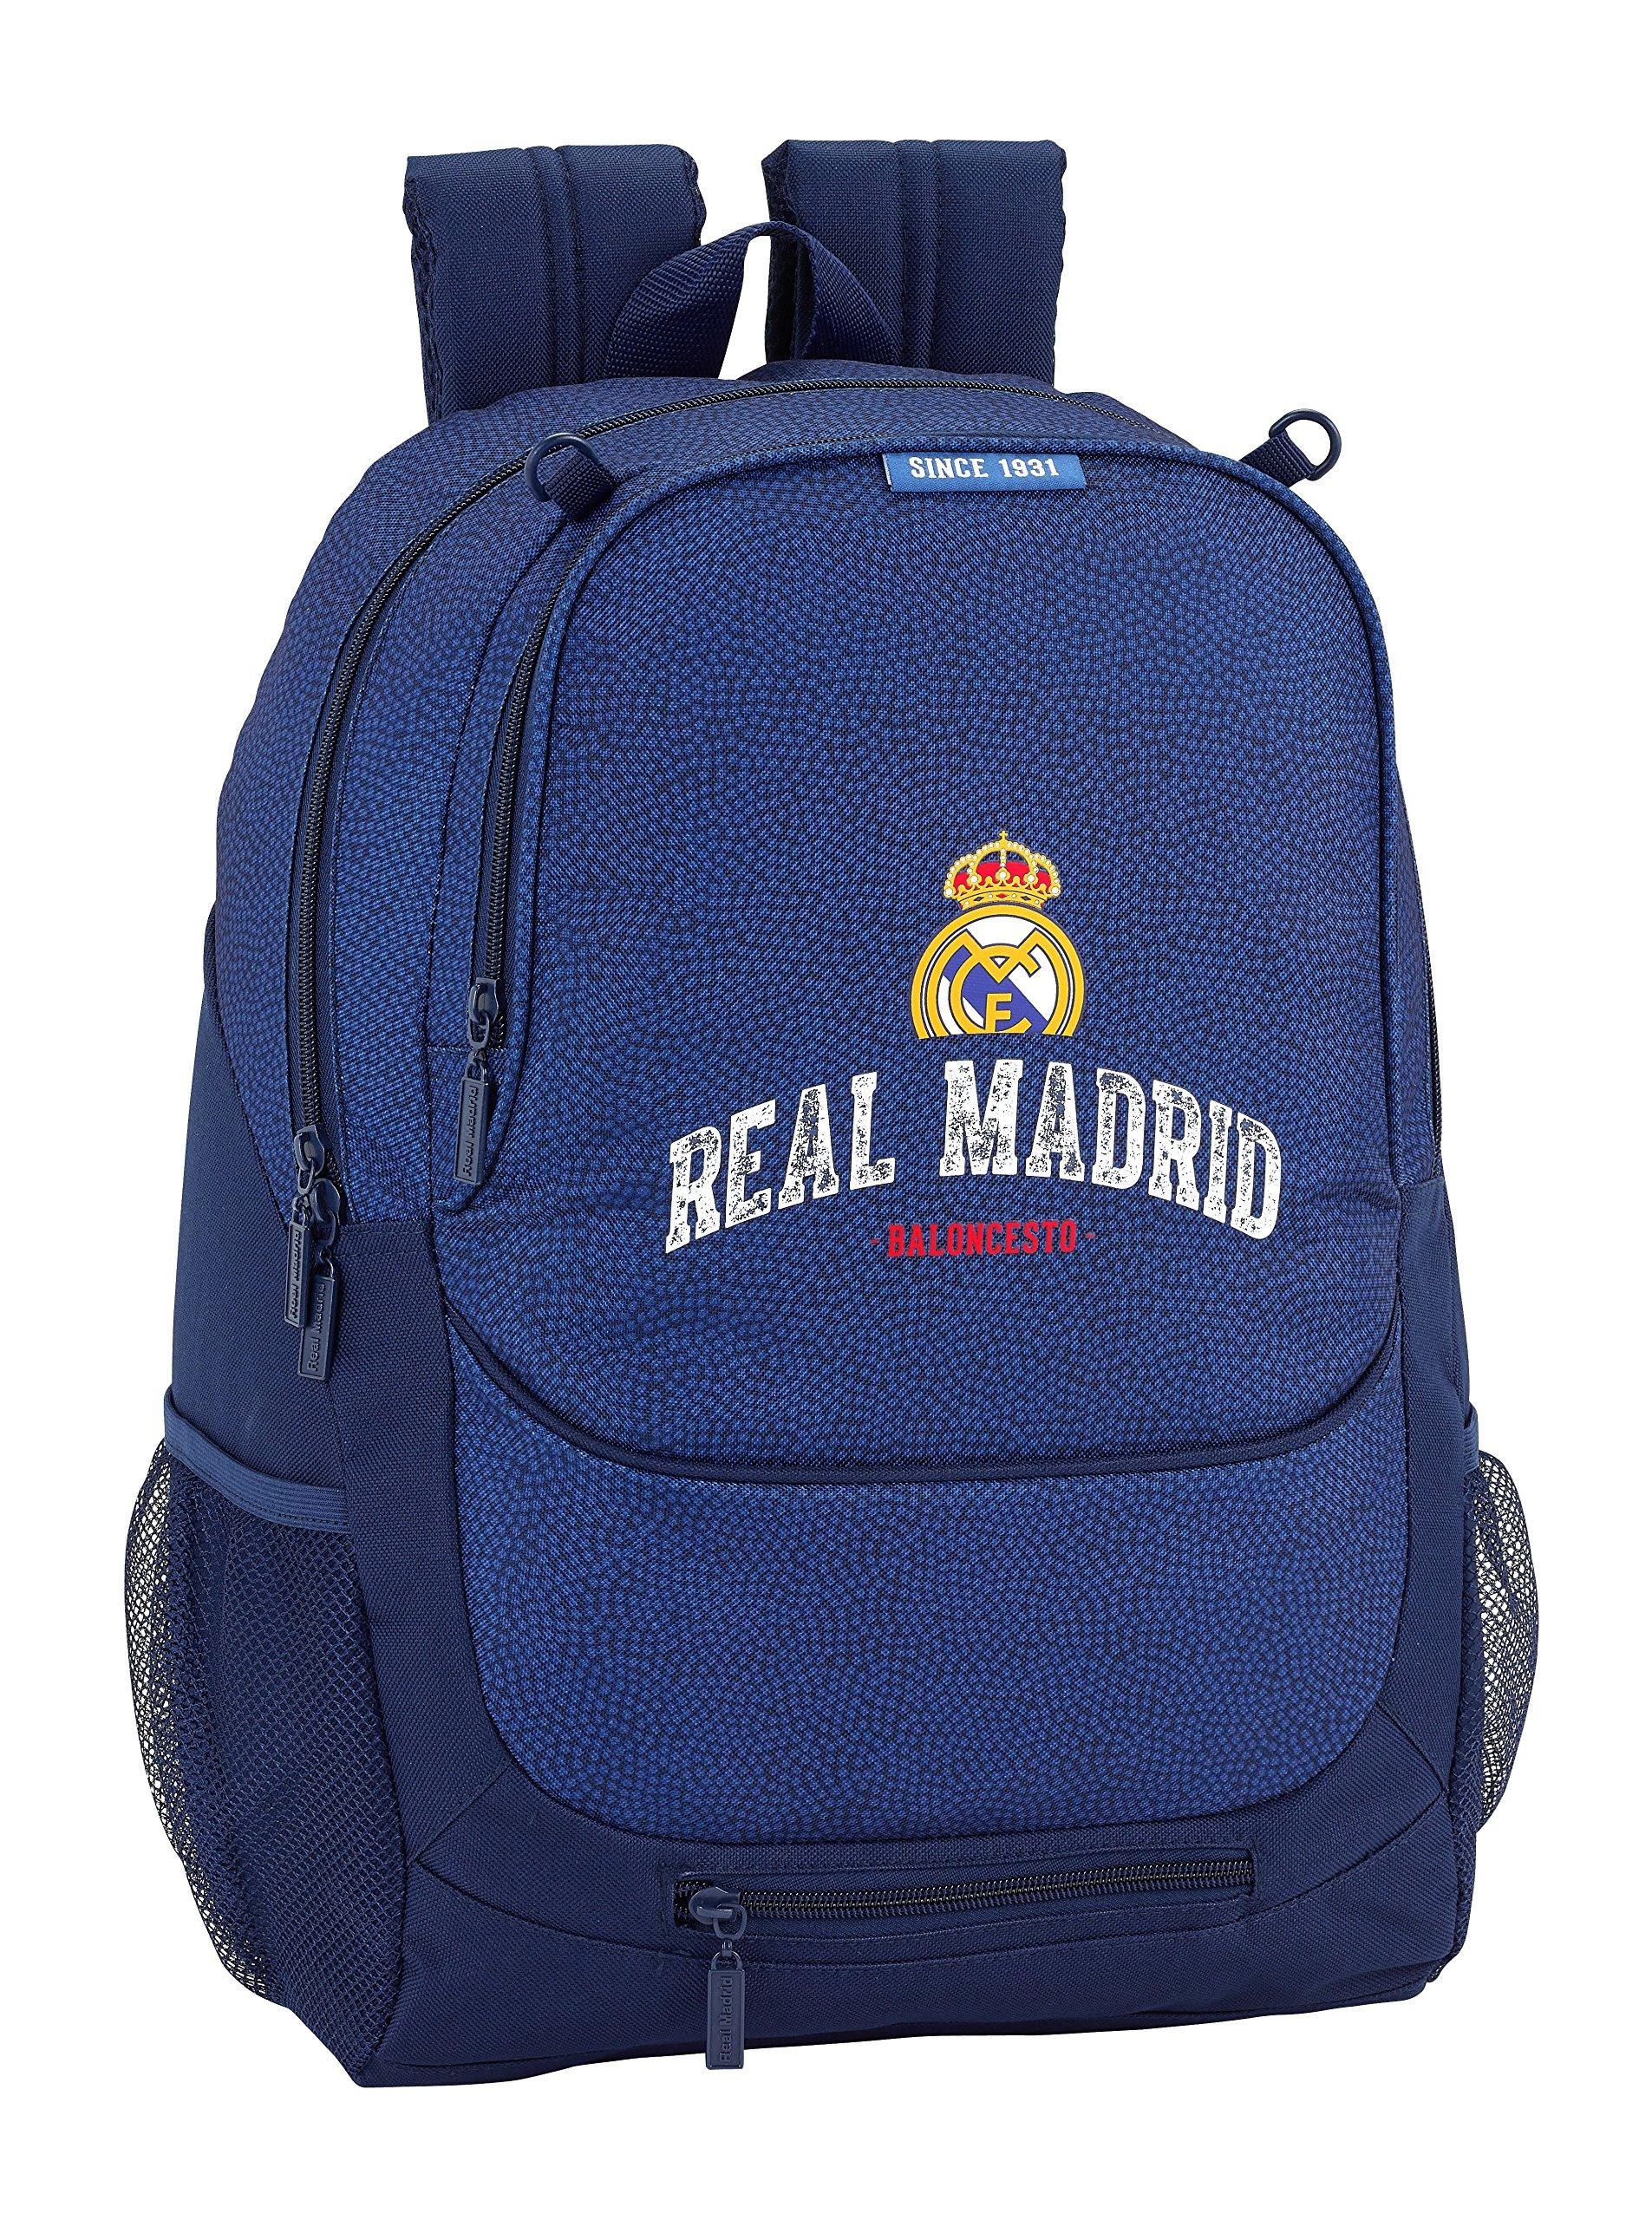 A1Q9OjJ78rL - Safta Mochila Escolar Real Madrid Basket Oficial 320x160x440mm